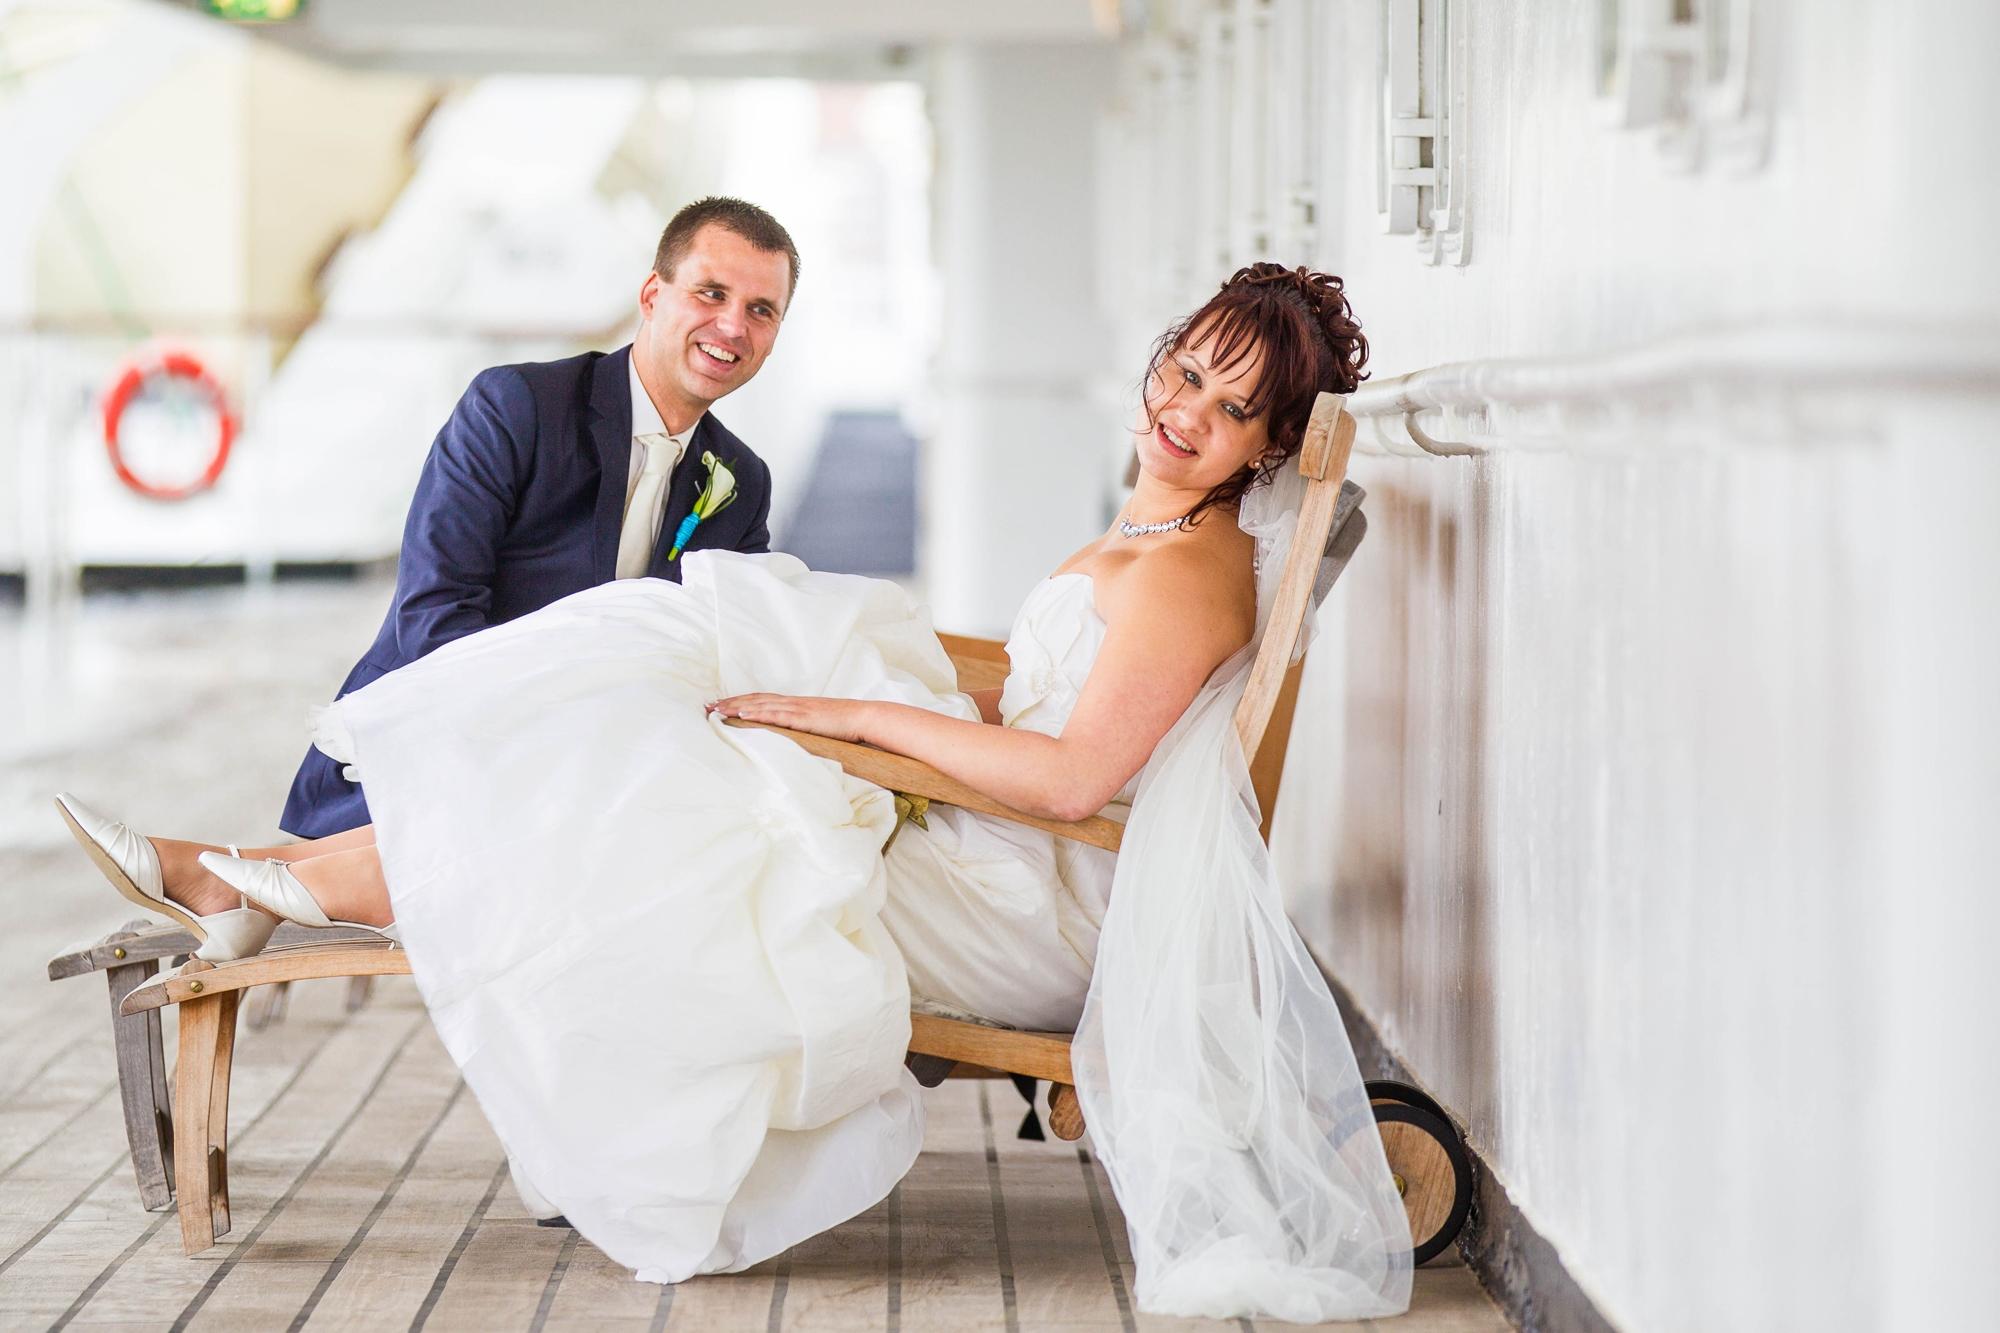 bruidsfotografie-trouwreportage-huwelijksfotografie-bruidsfotograaf-feestfotografie-Hans en Anne-93.jpg